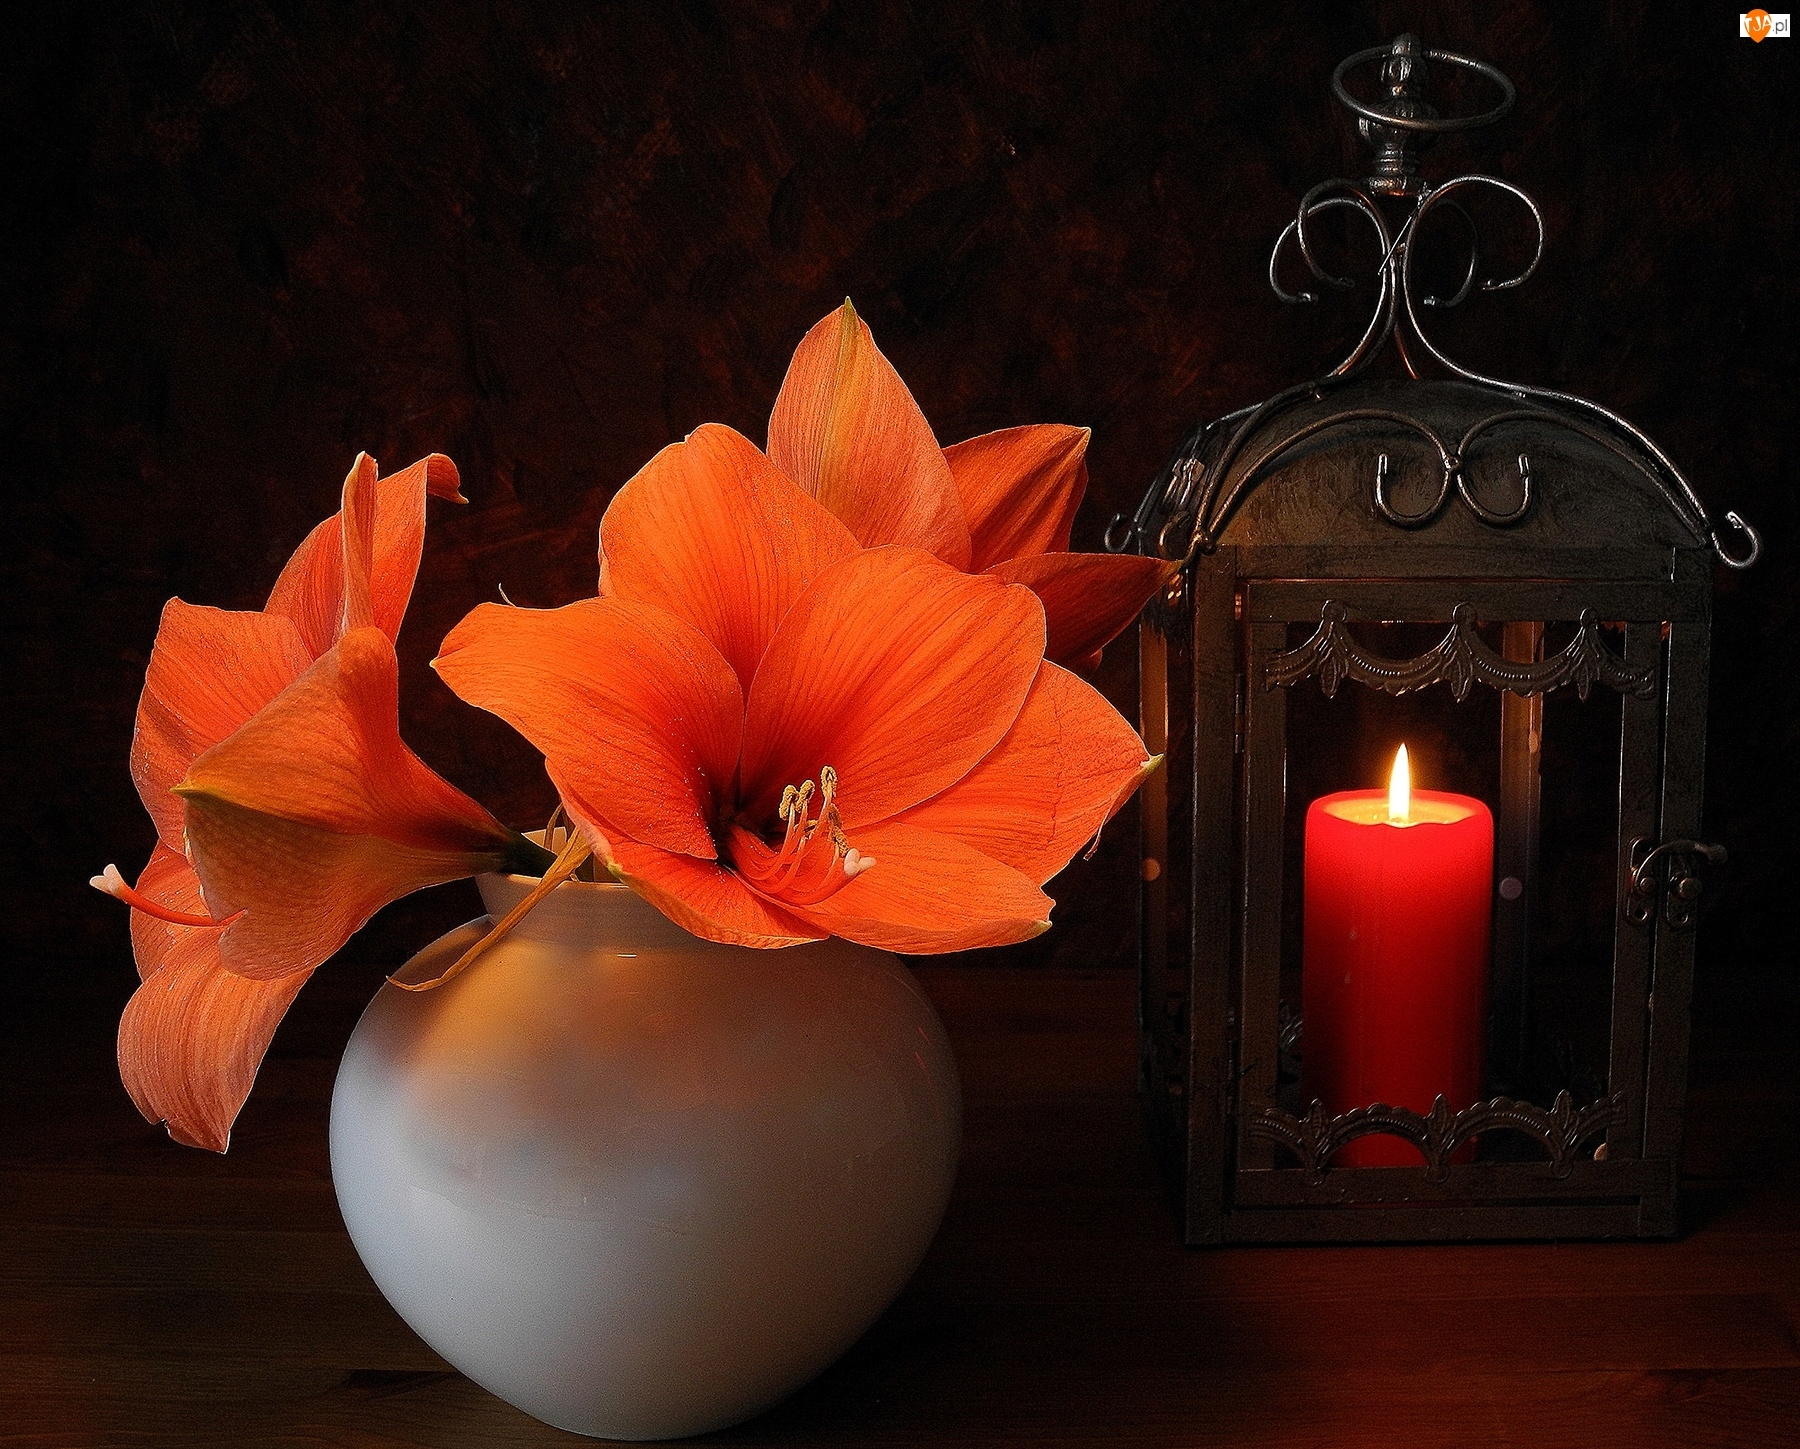 Lampion, Amarylis, Świeca, Ogień